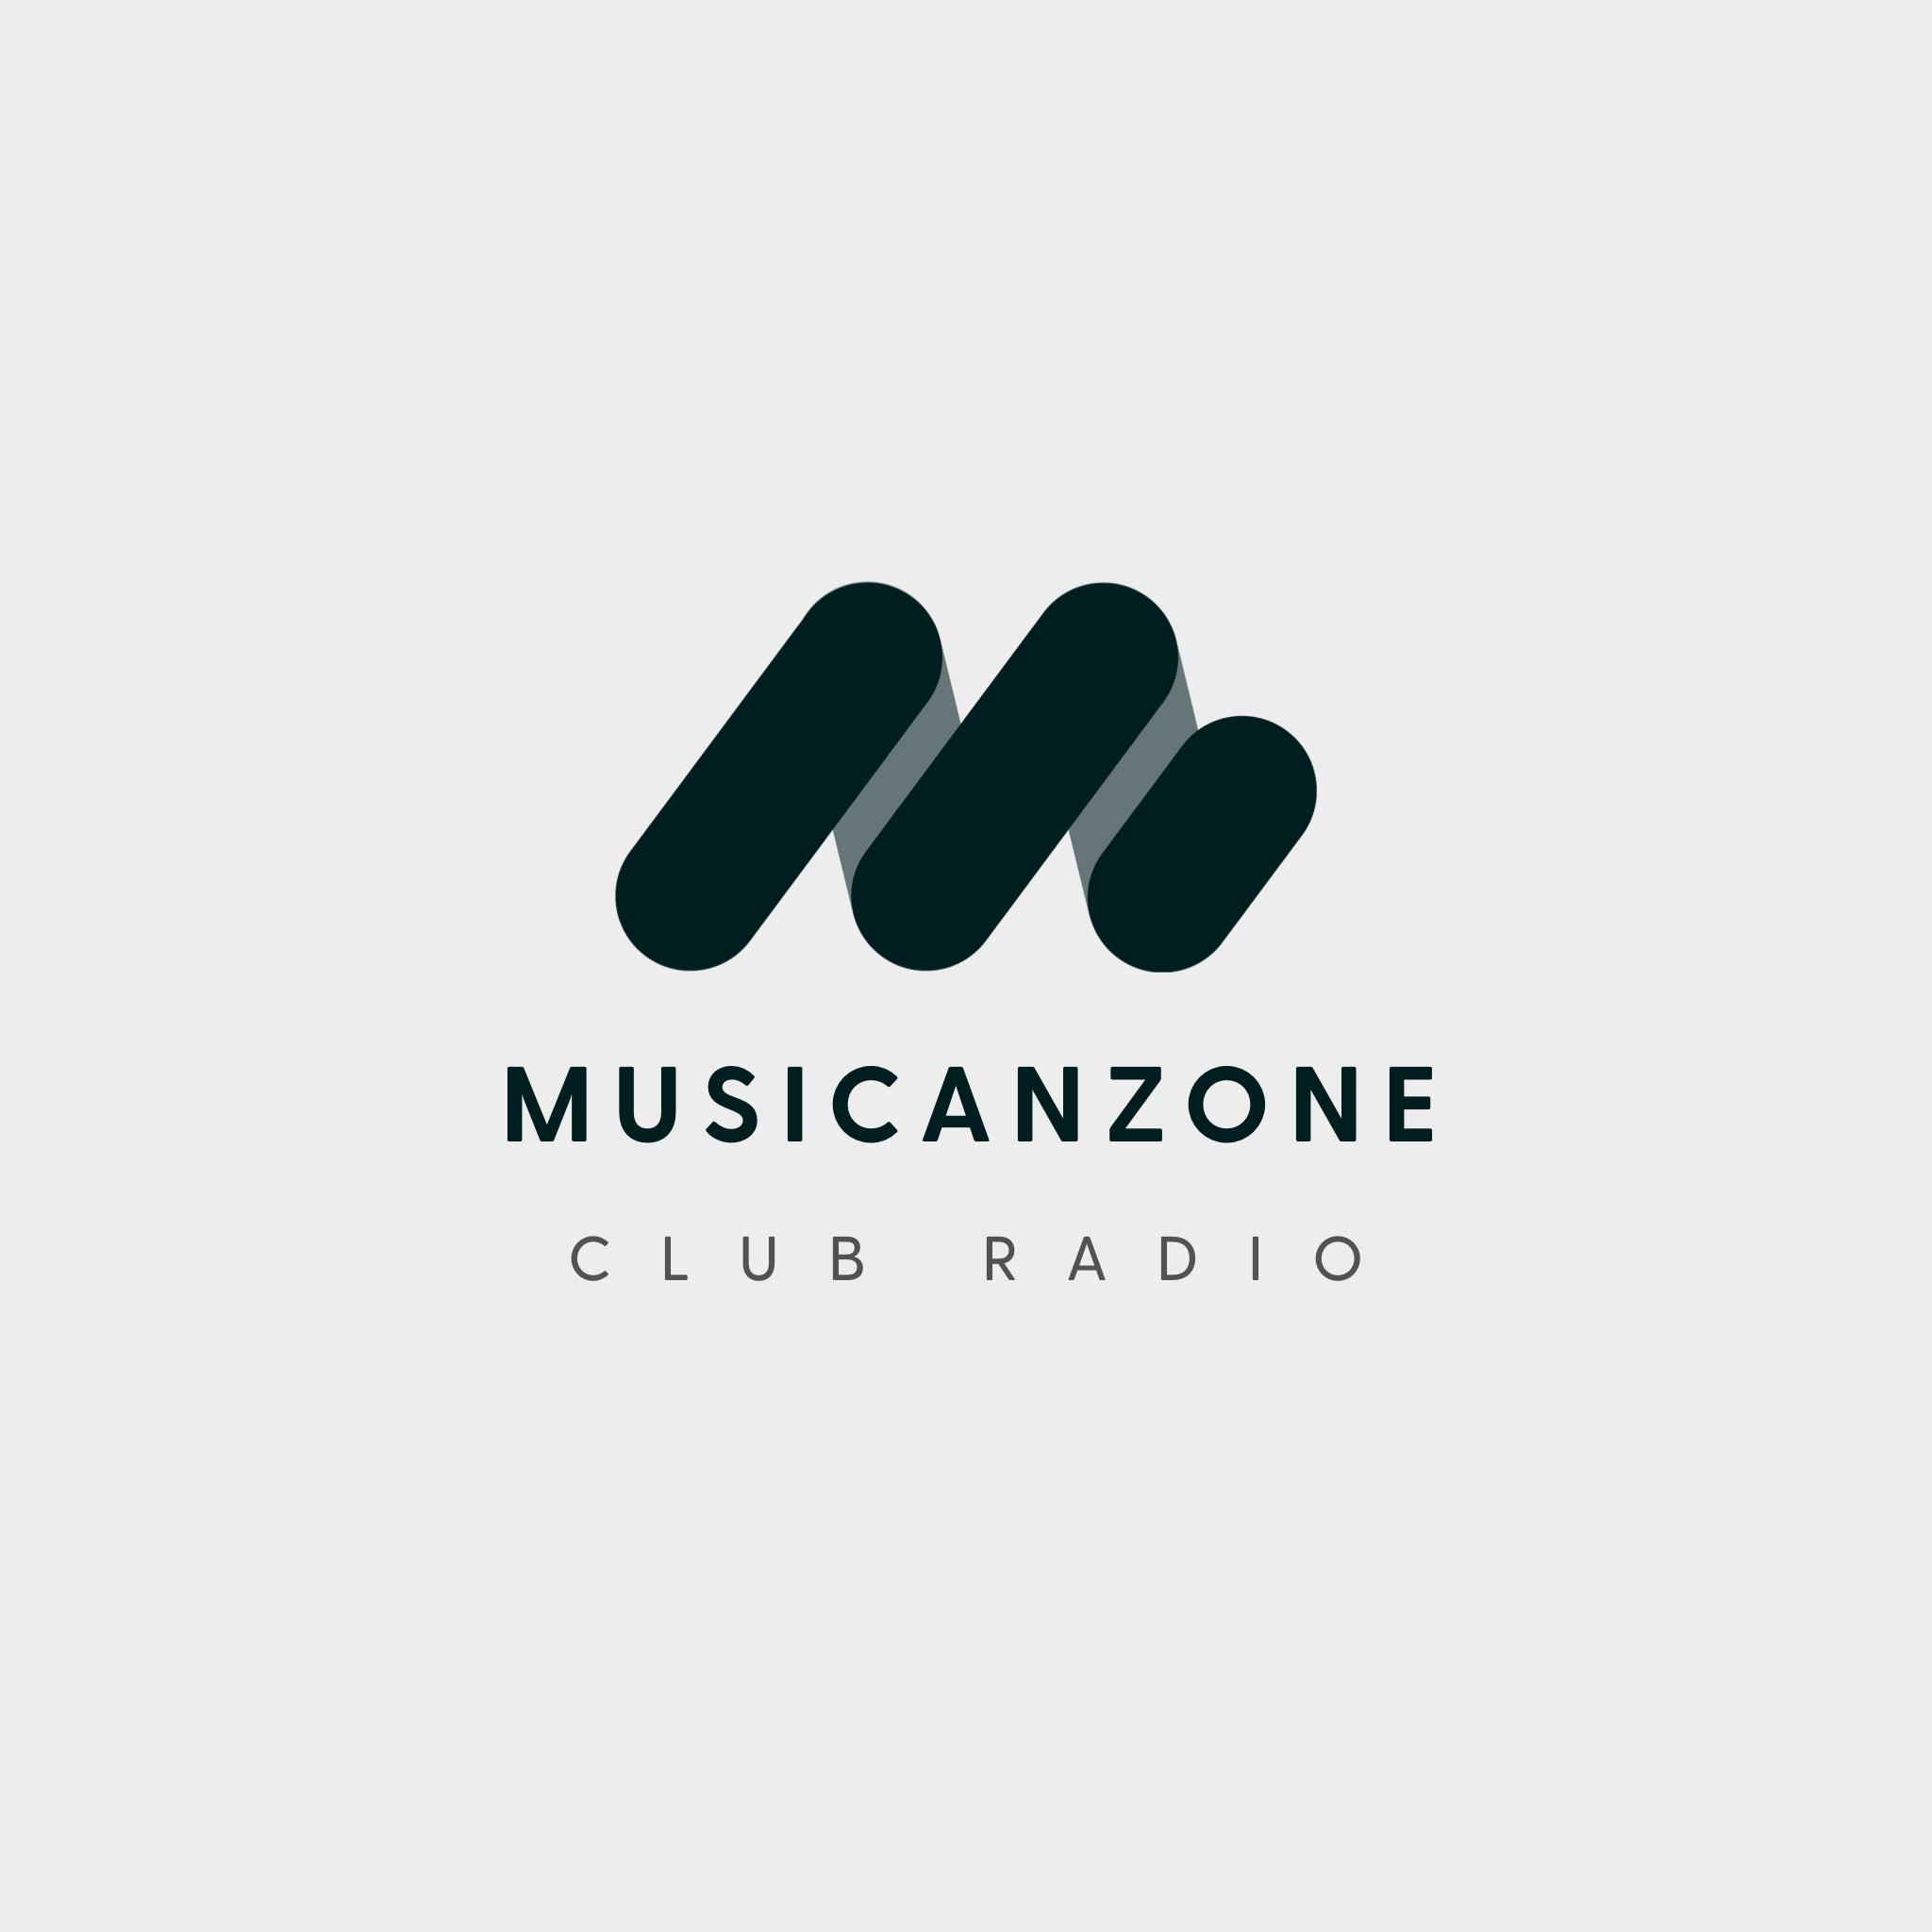 MUSICANZONE CLUB